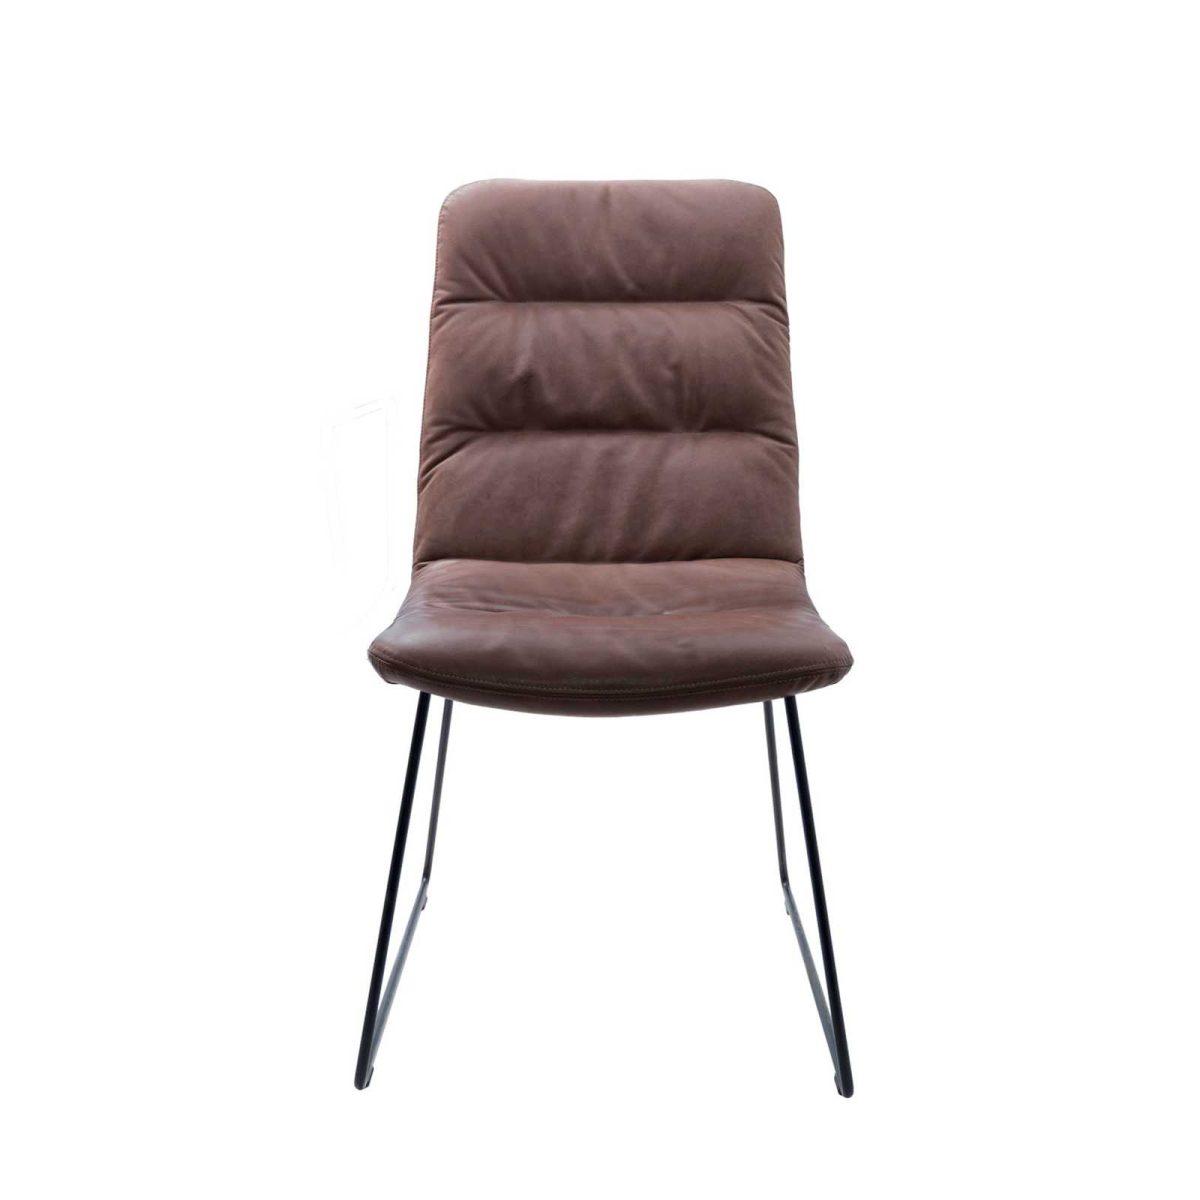 KFF ARVA LIGHT chair with or without armrests designed by KFF | dining | ARVA LIGHT Stuhl mit oder ohne Armlehnen designed by KFF